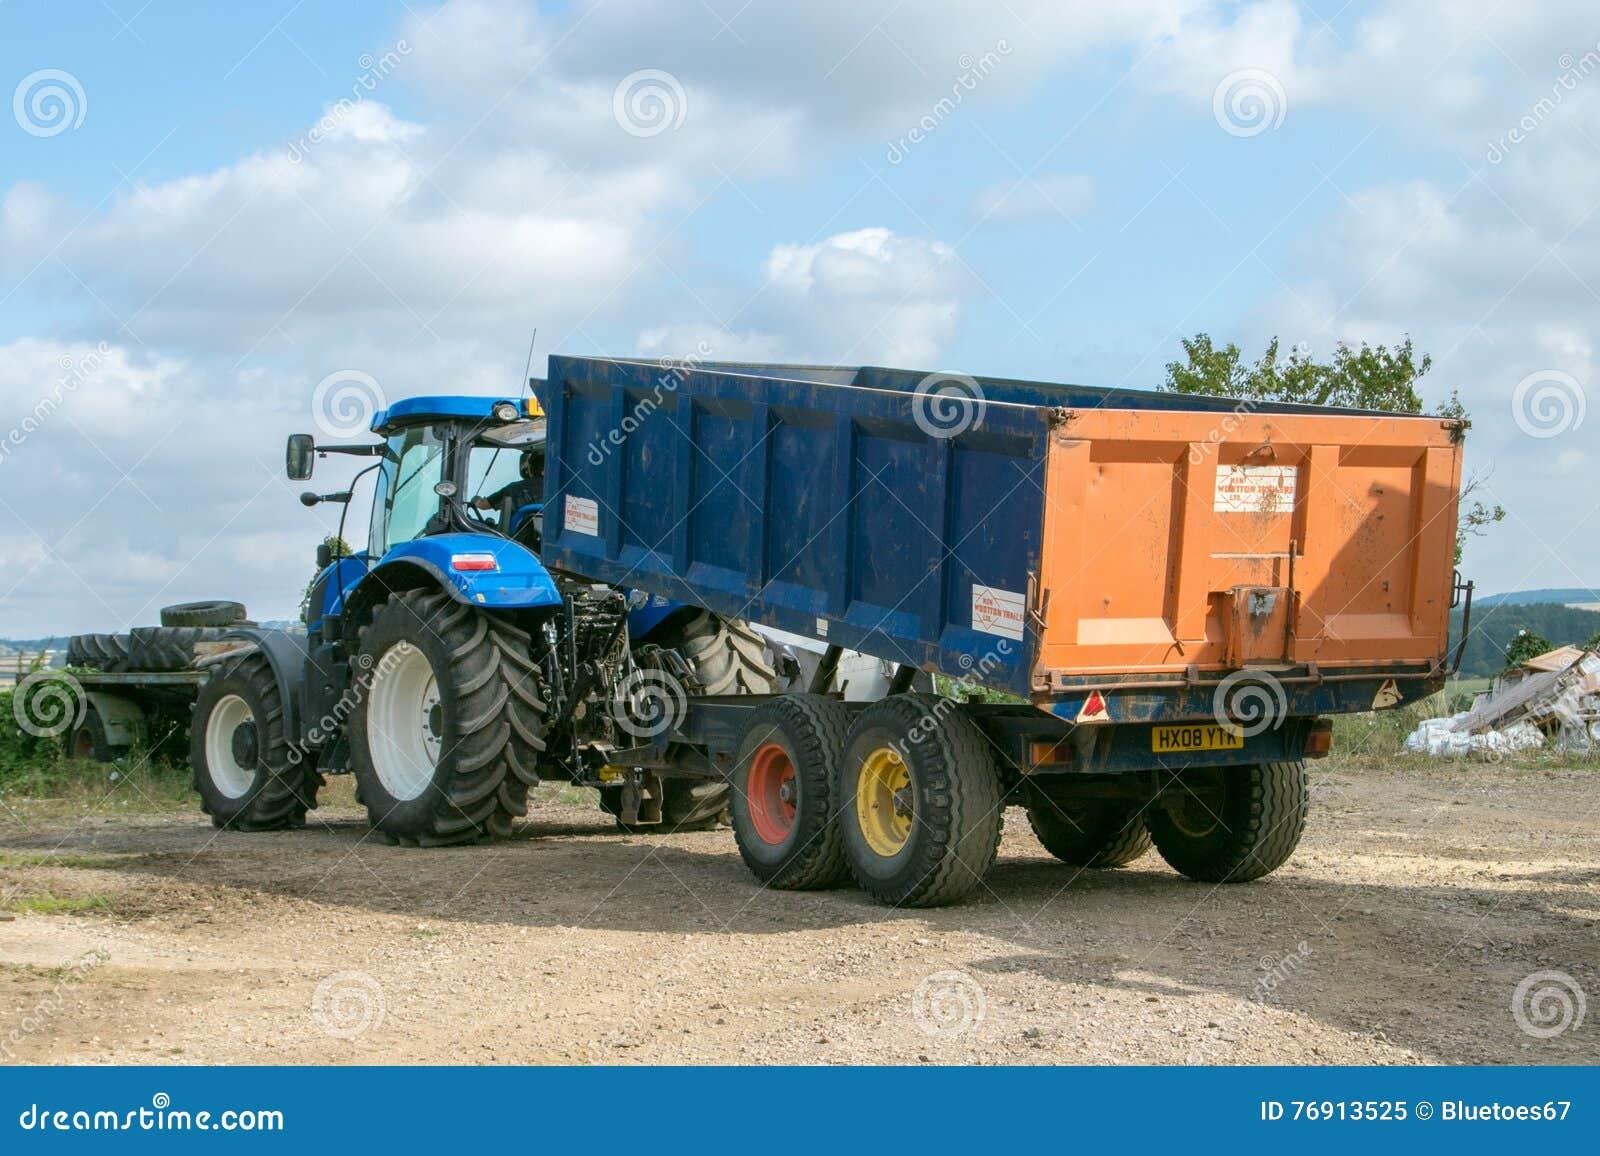 tracteur bleu moderne tirant une remorque dans la basse cour image ditorial image du deere. Black Bedroom Furniture Sets. Home Design Ideas